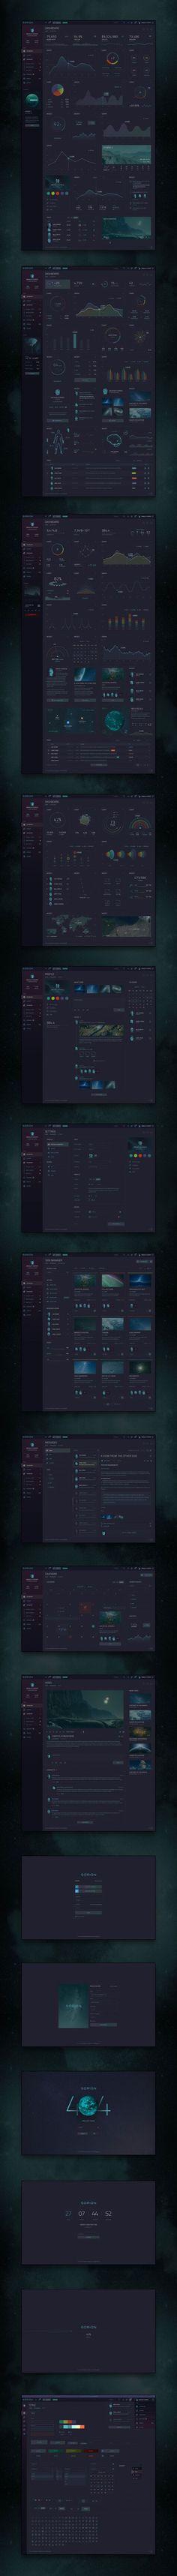 Orion Sci-Fi Dashboard - Visual Hierarchy